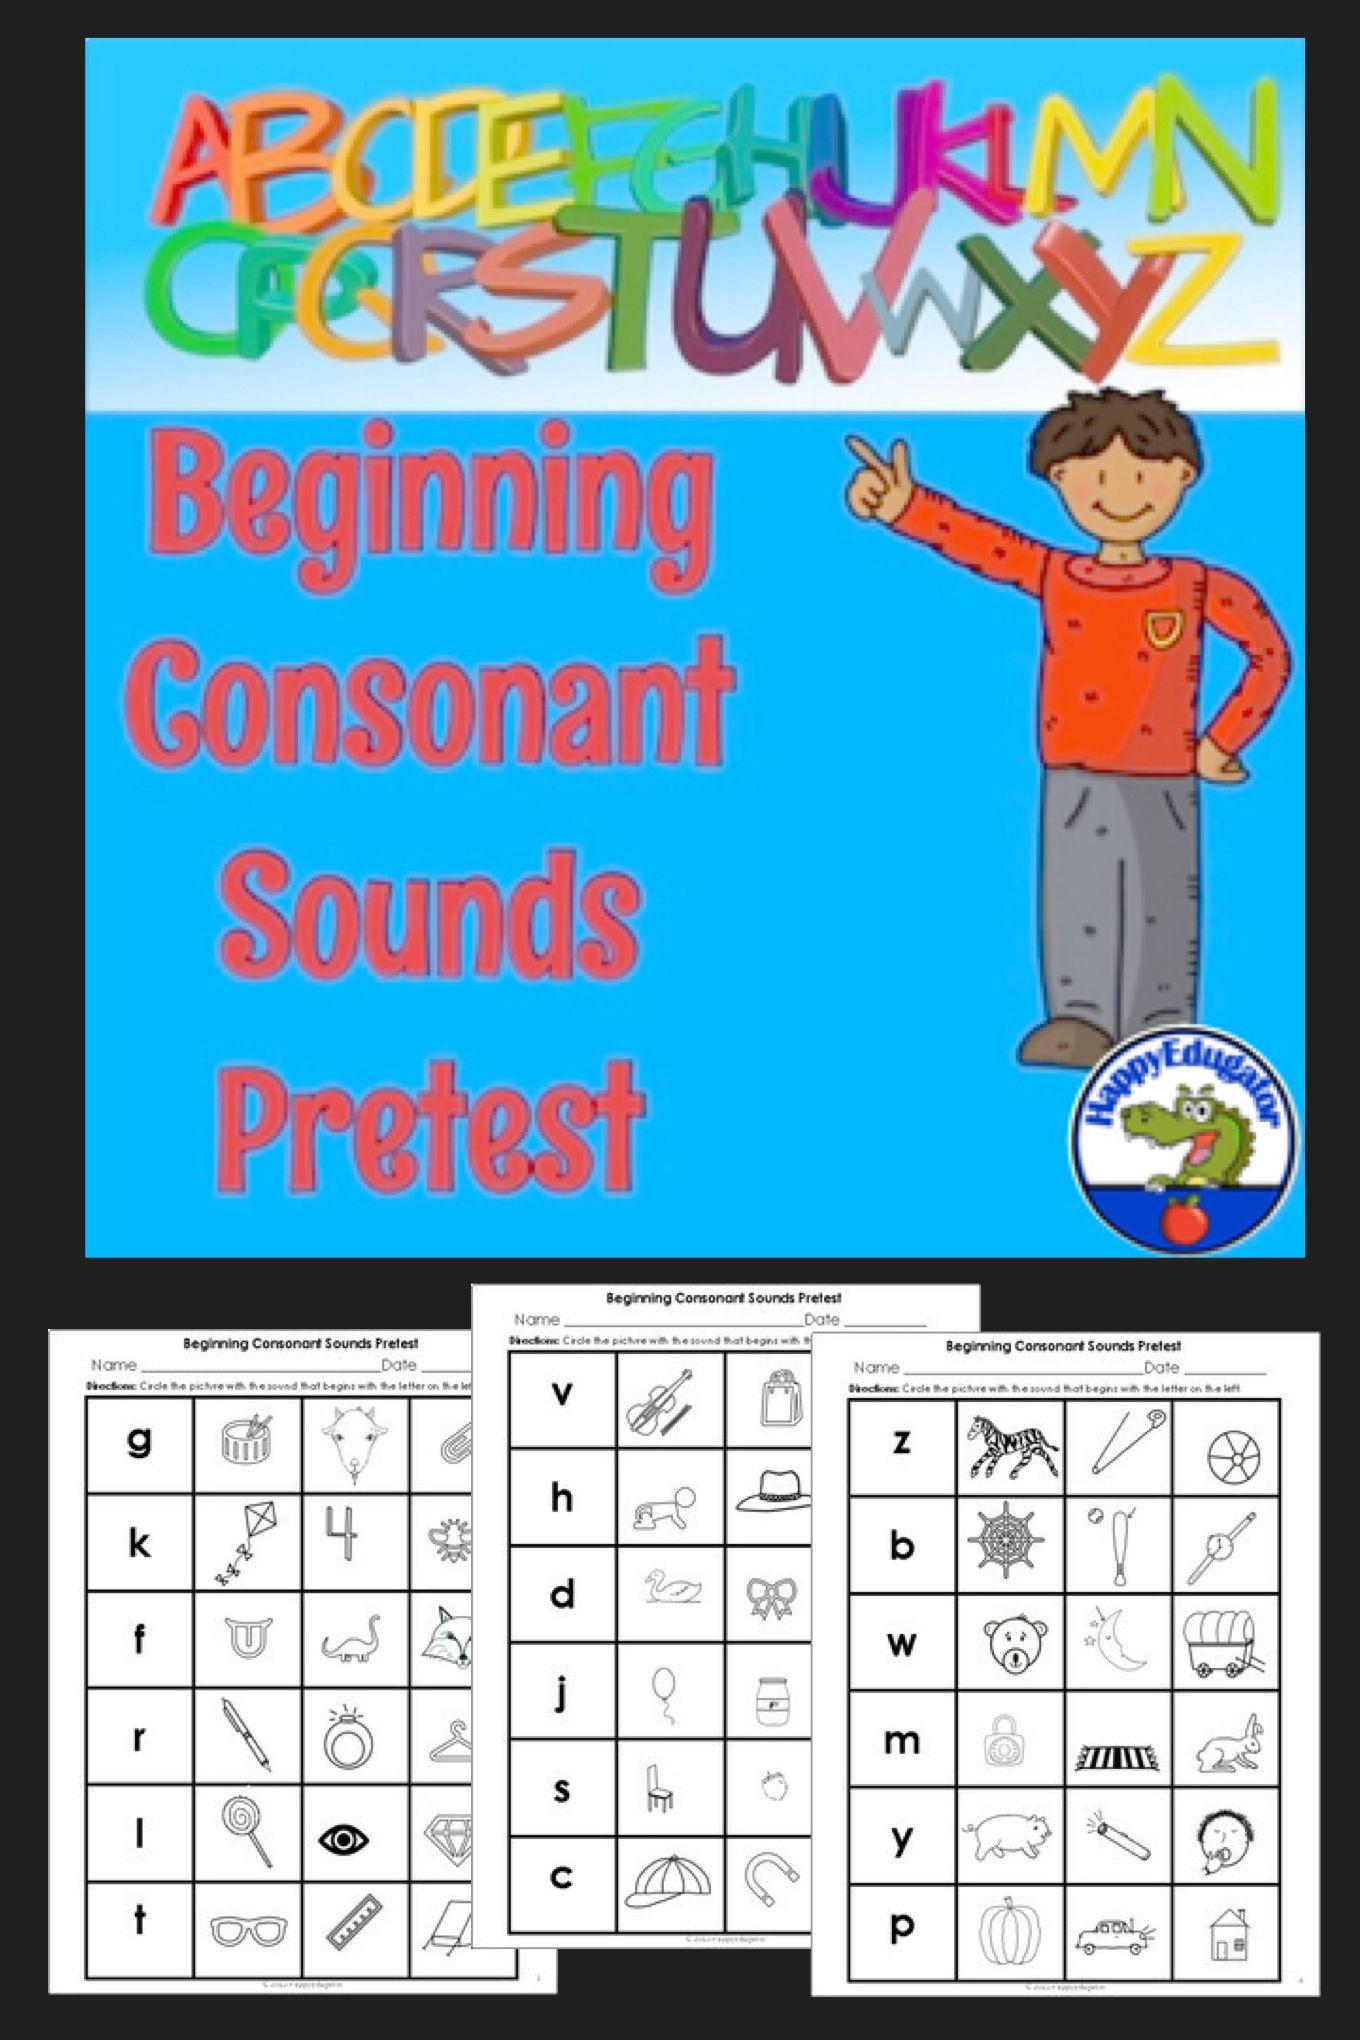 Beginning Consonant Sounds Pretest